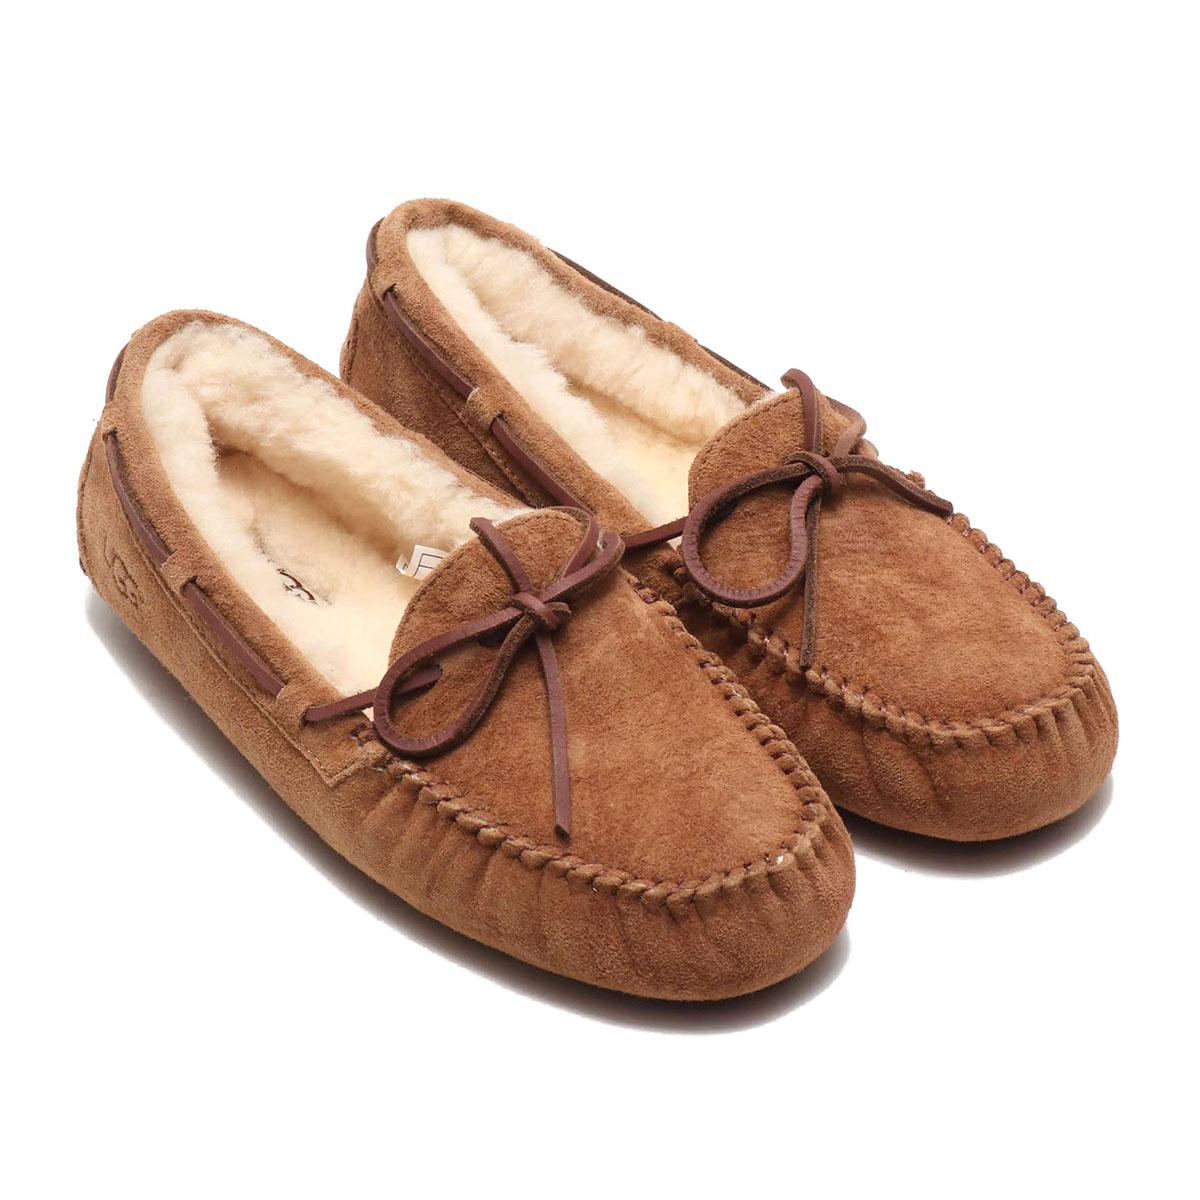 21a74a2c3 Ugg Crocs